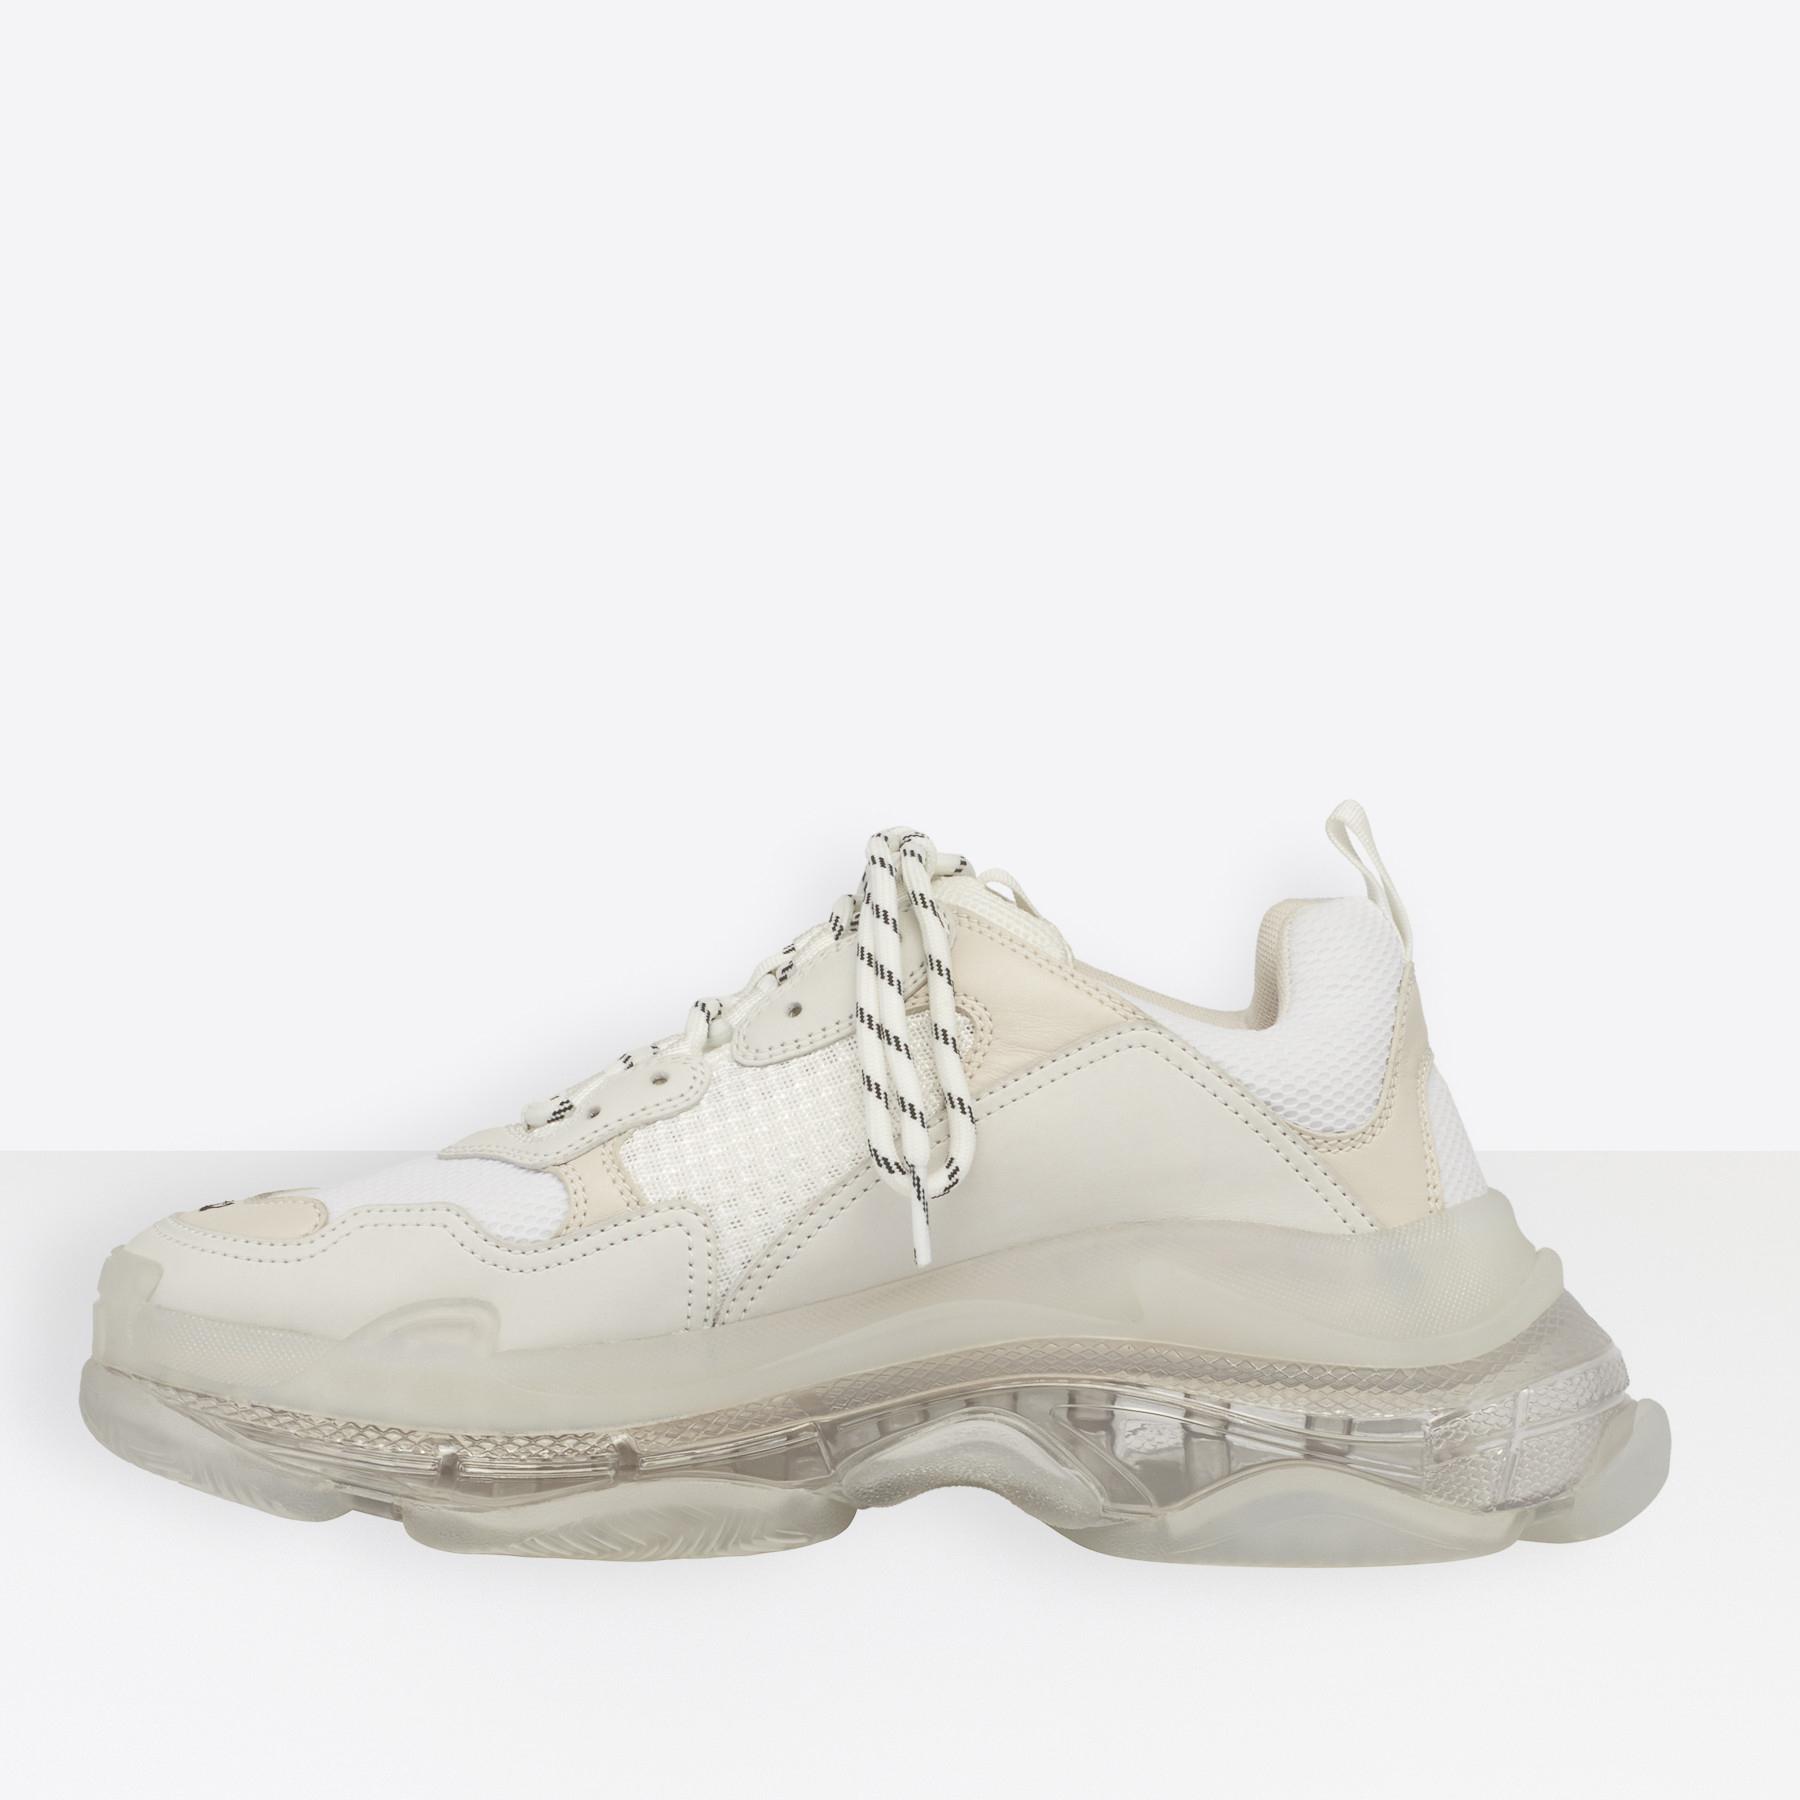 Balenciaga Triple S White/Trn